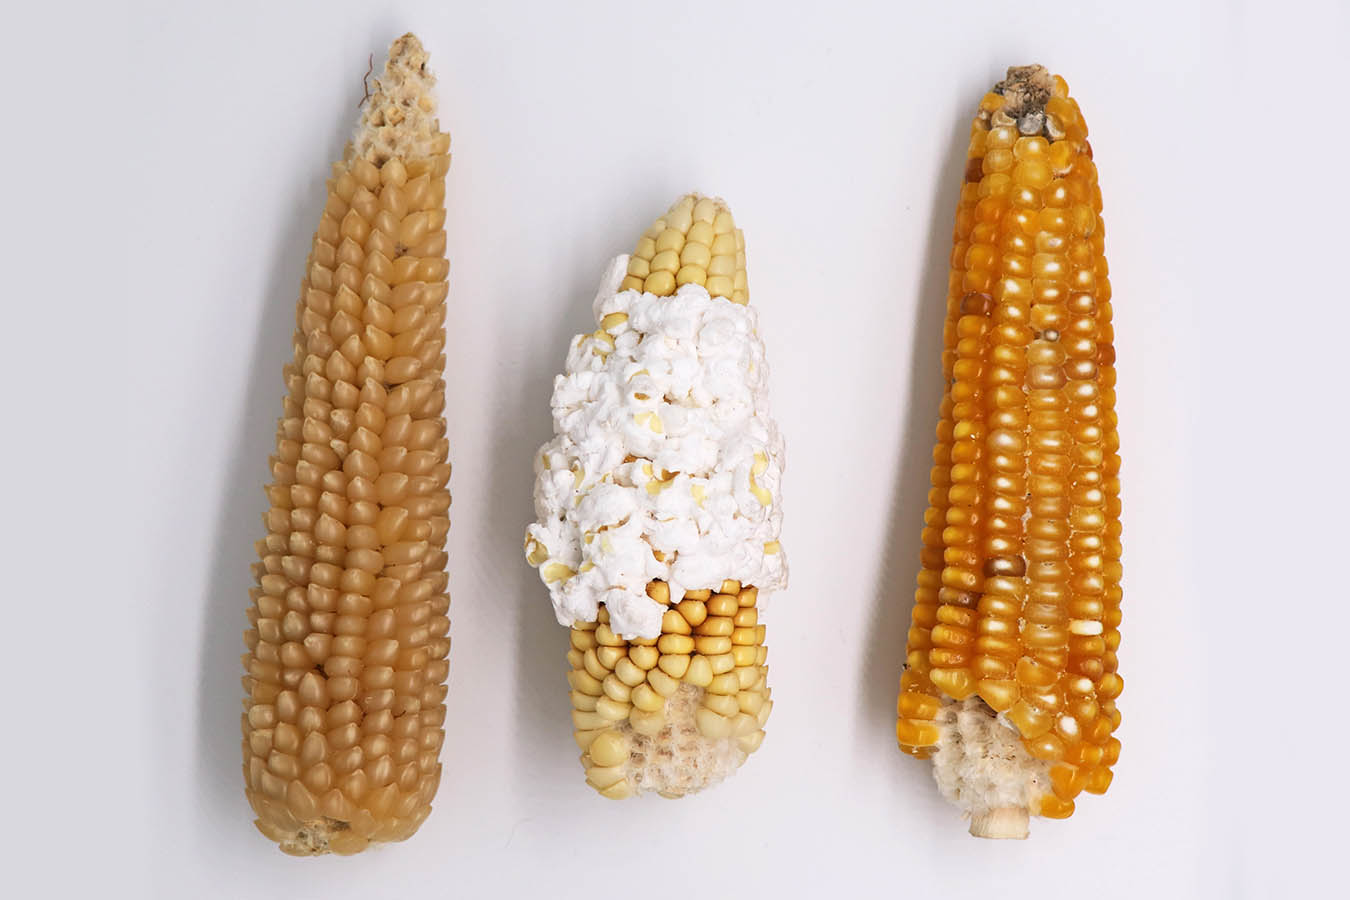 maiz palomero popcorn tipos de maiz maiz criollo maiz mexicano semillas de maiz tipos de granos de maiz